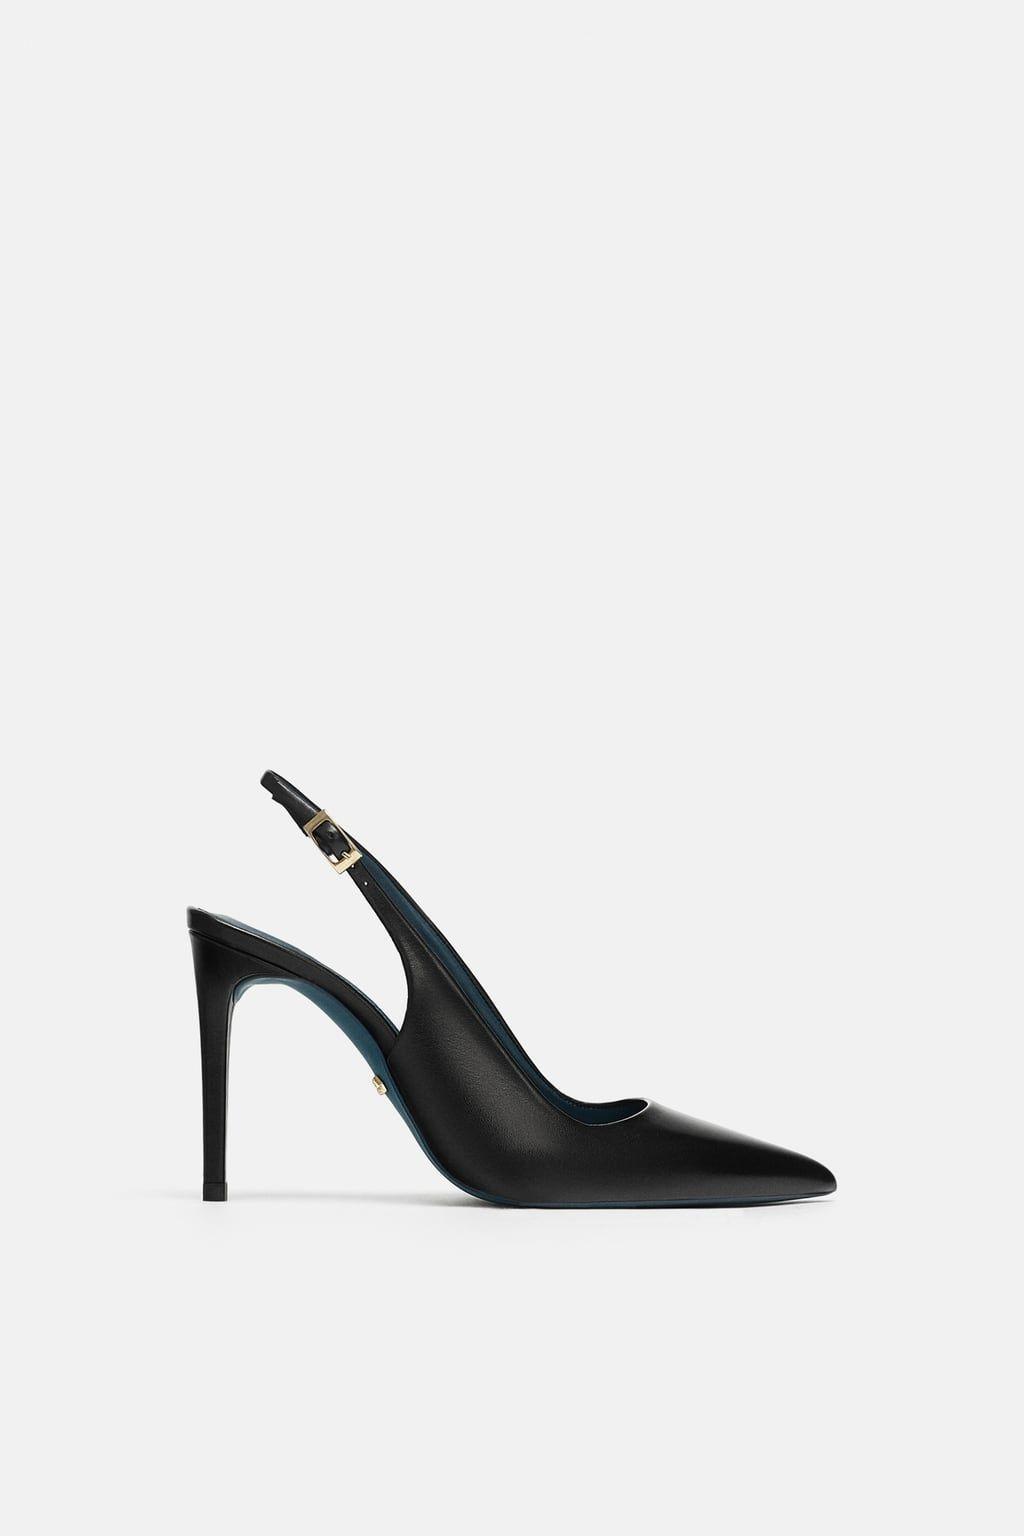 4ec33155103 Black sling-back pumps, Zara. FW Trends 2018/2019   heels in 2019 ...